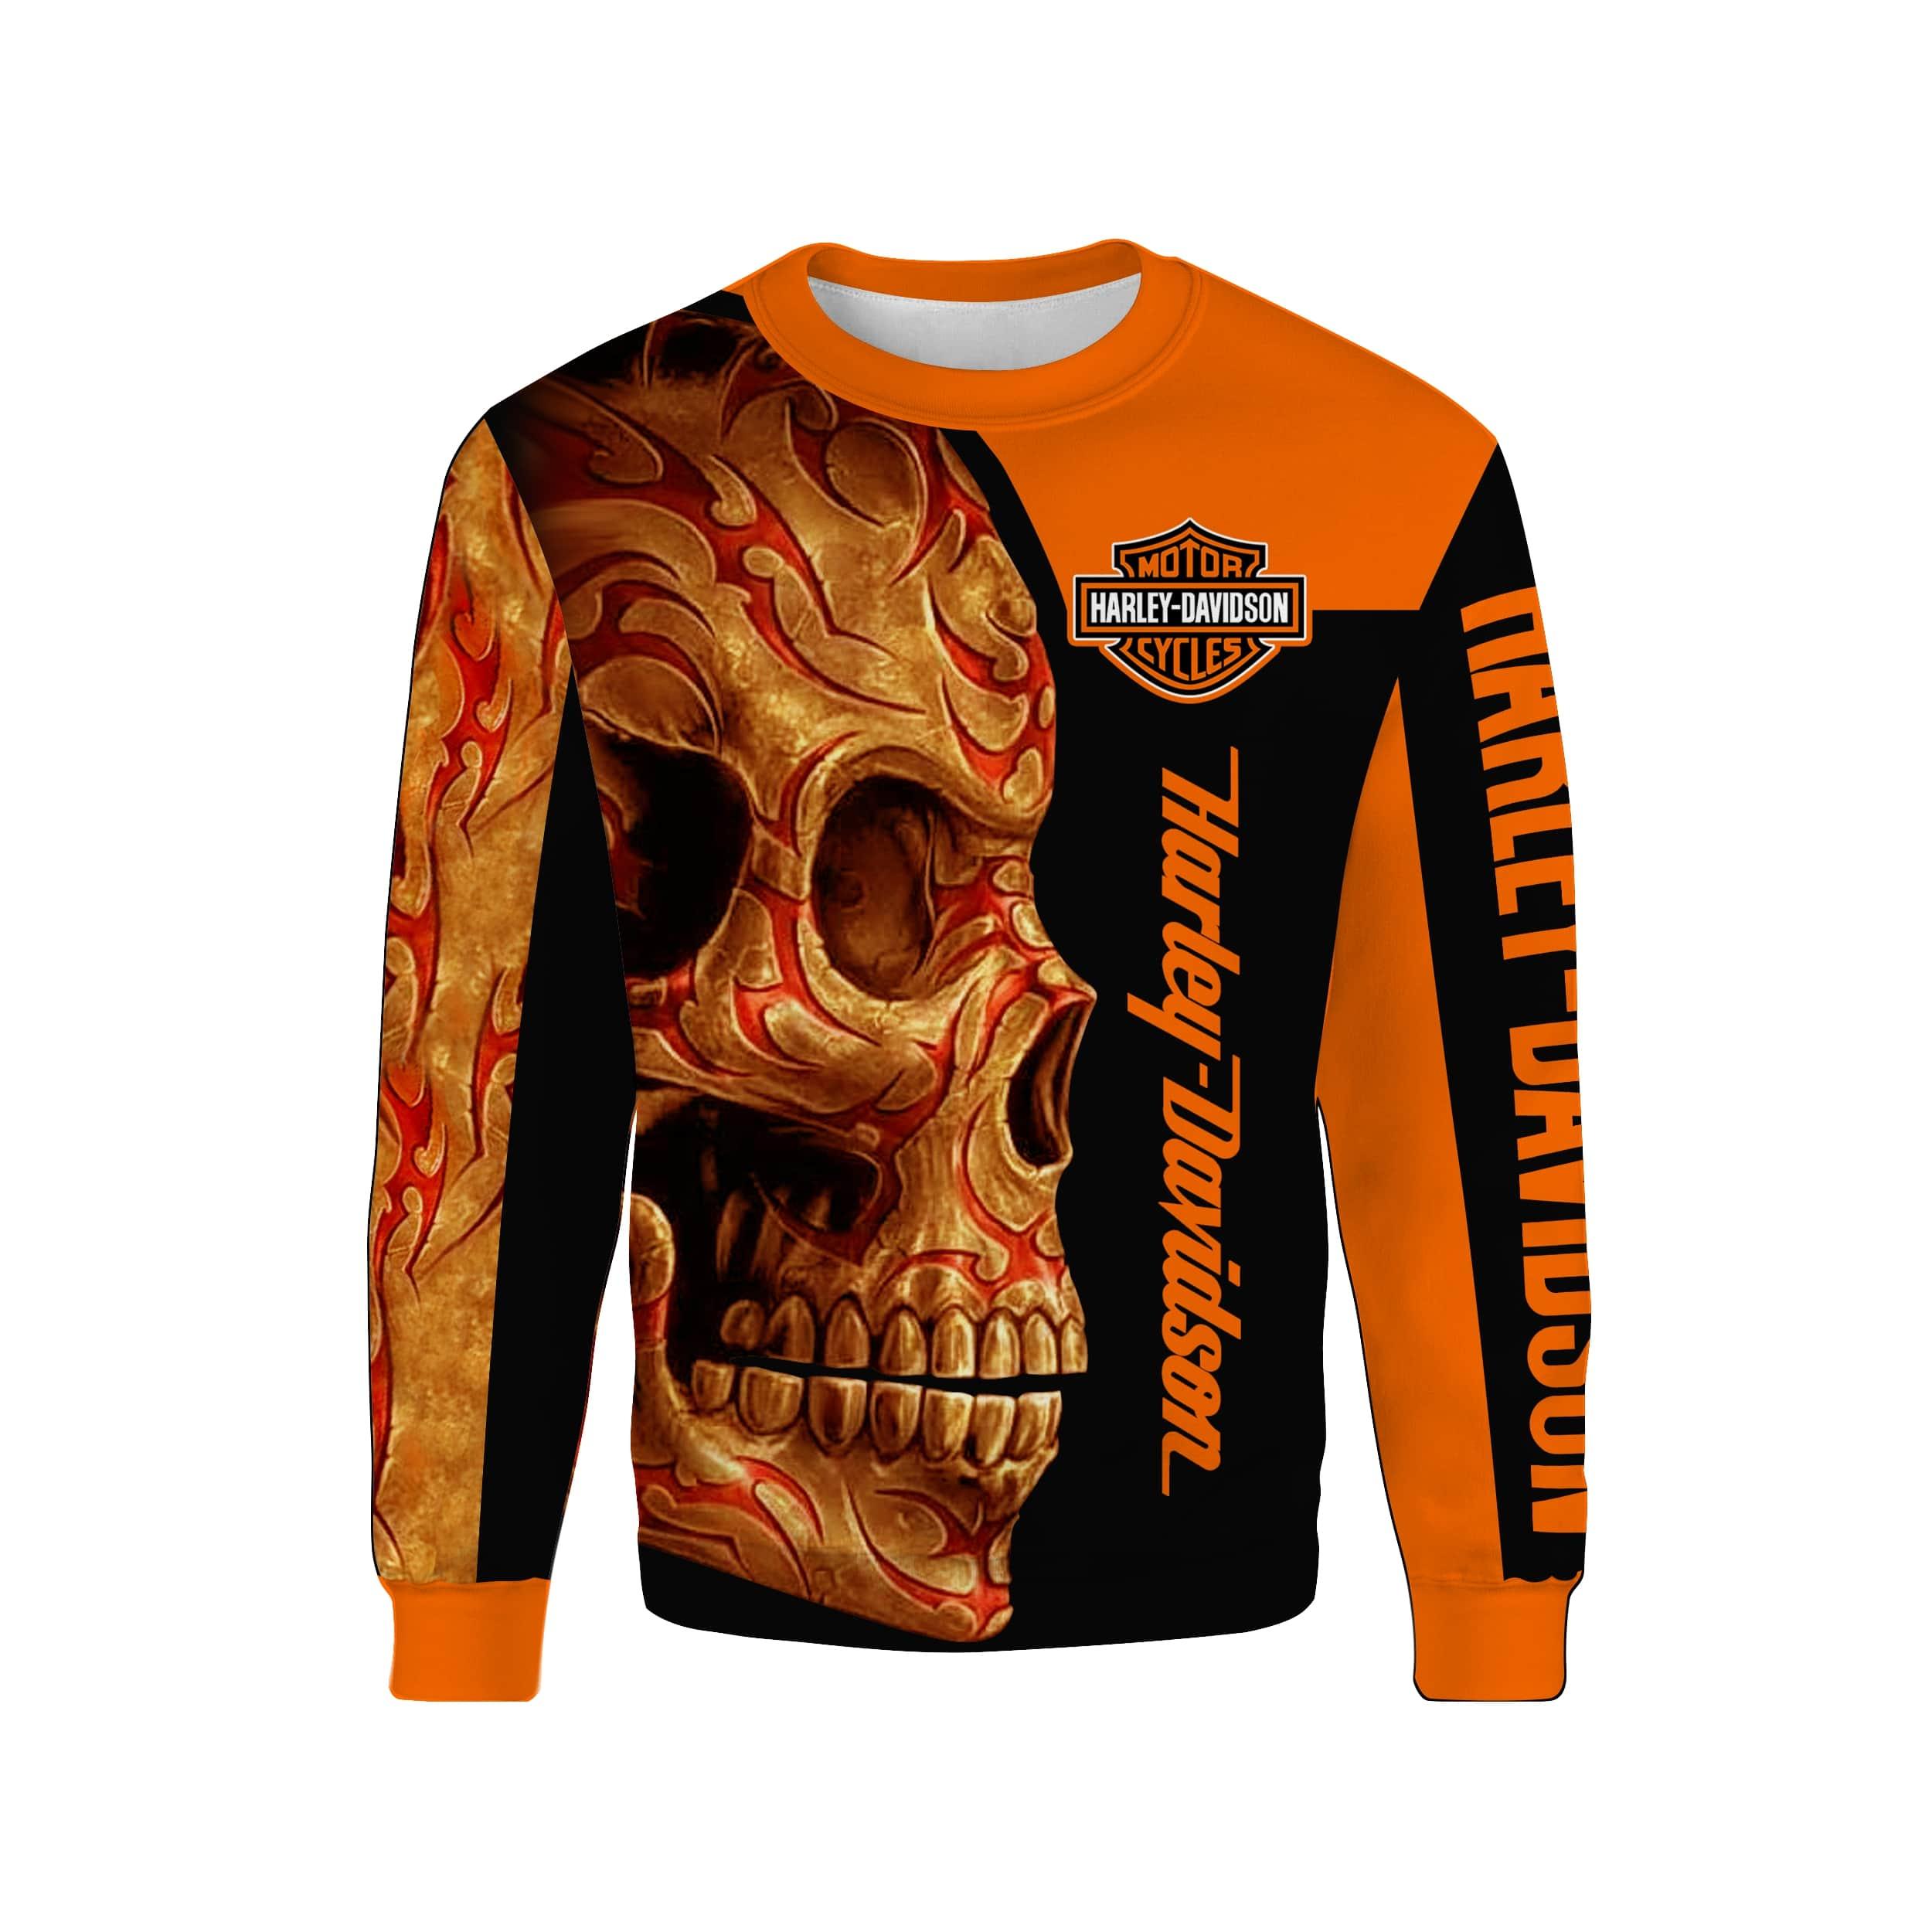 Harley-davidson motorcycle sugar skull full printing sweatshirt